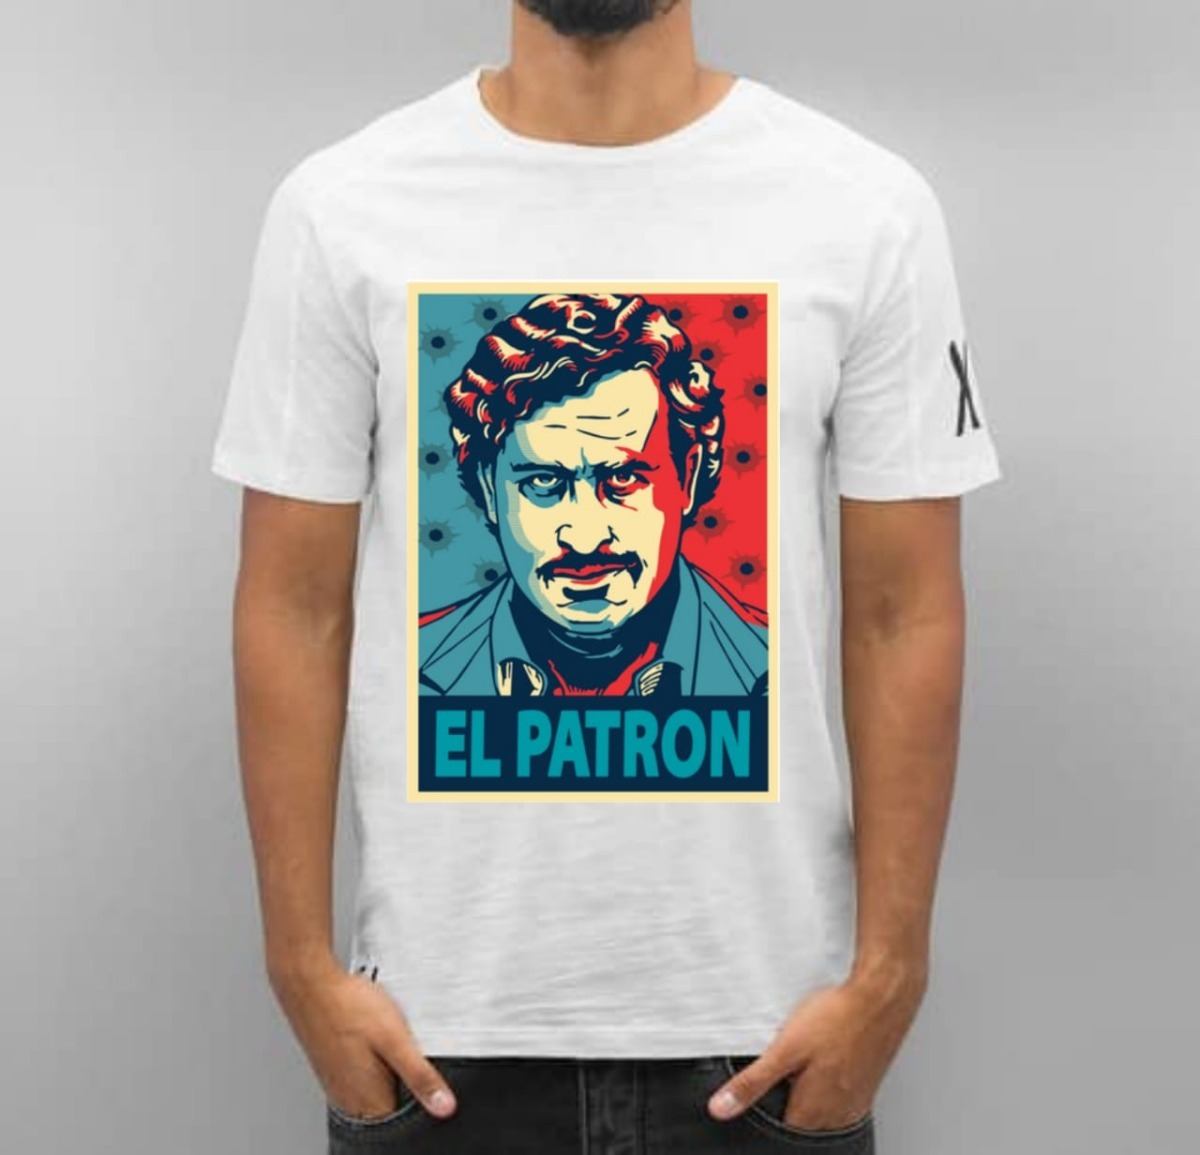 Camiseta Pablo Escobar -   55.000 en Mercado Libre b94c8ac7254